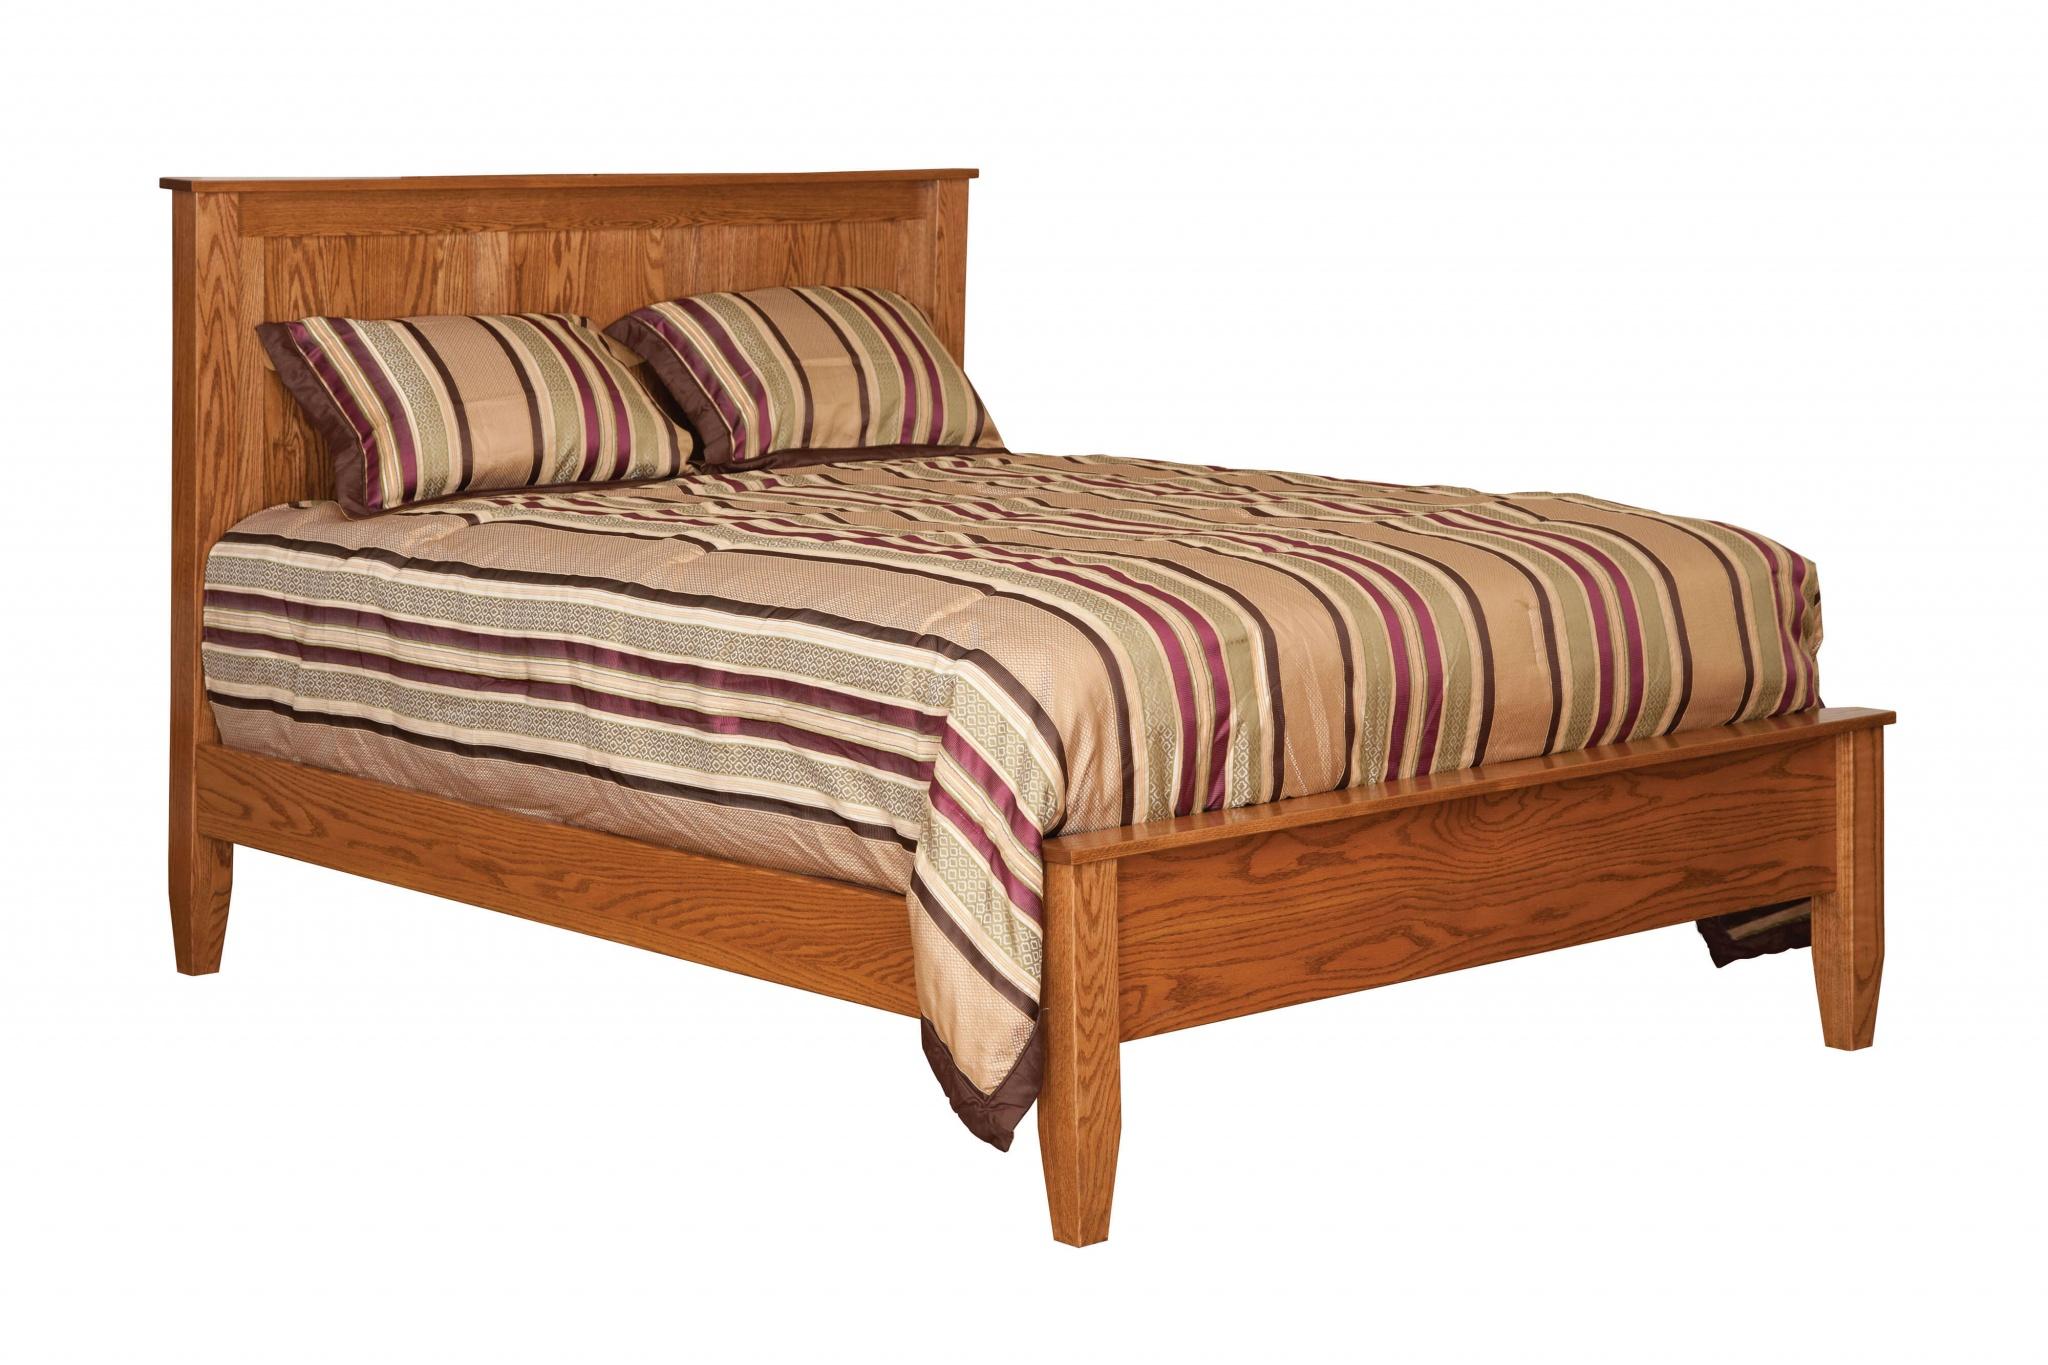 English Shaker Panel Bed